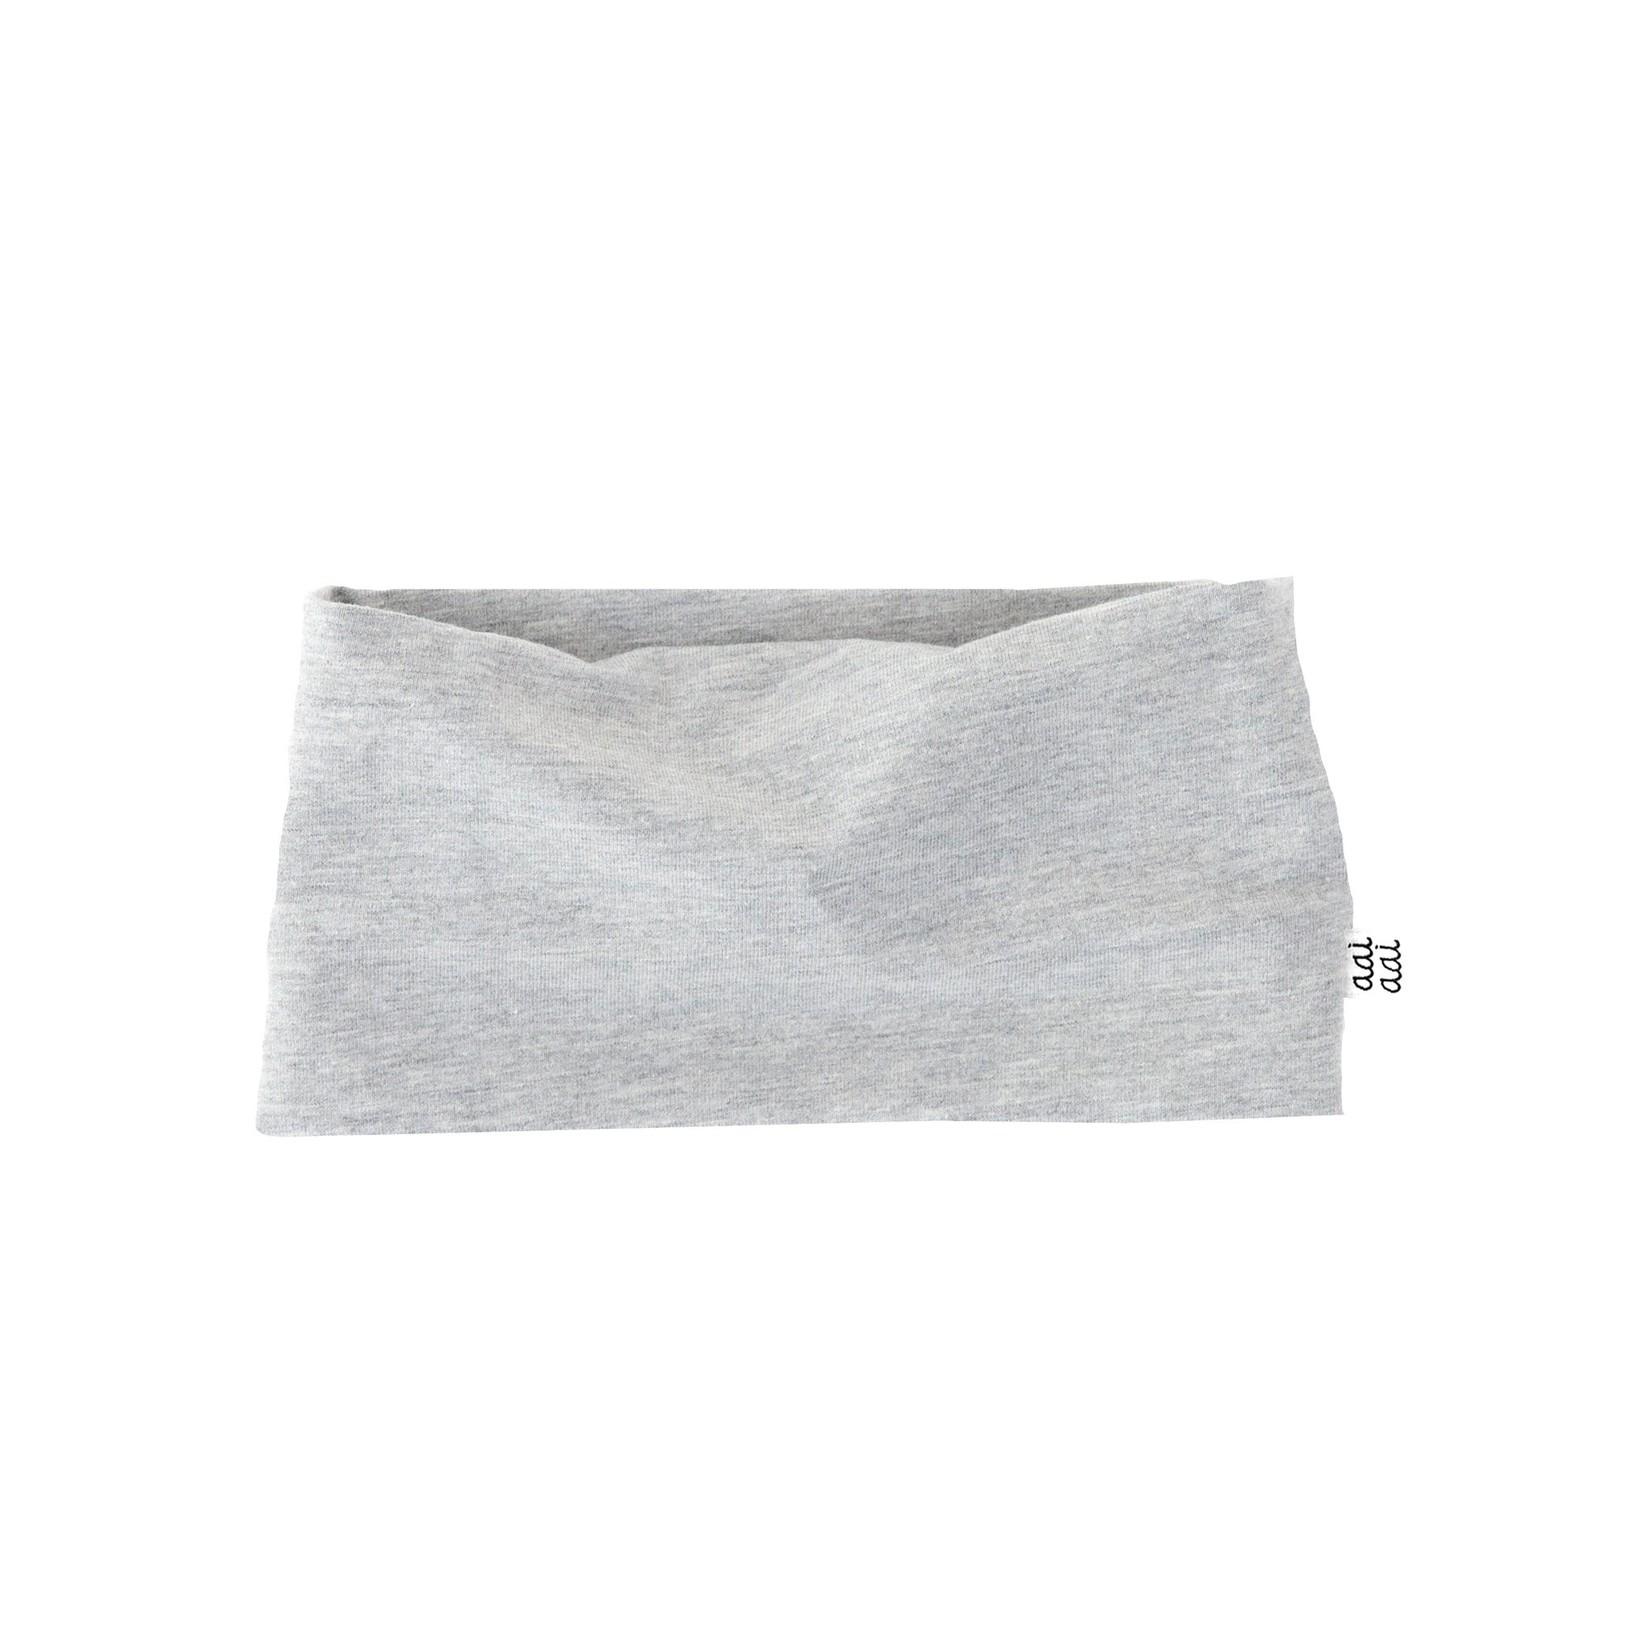 AAI AAI Infinity sjaal (Grijs)